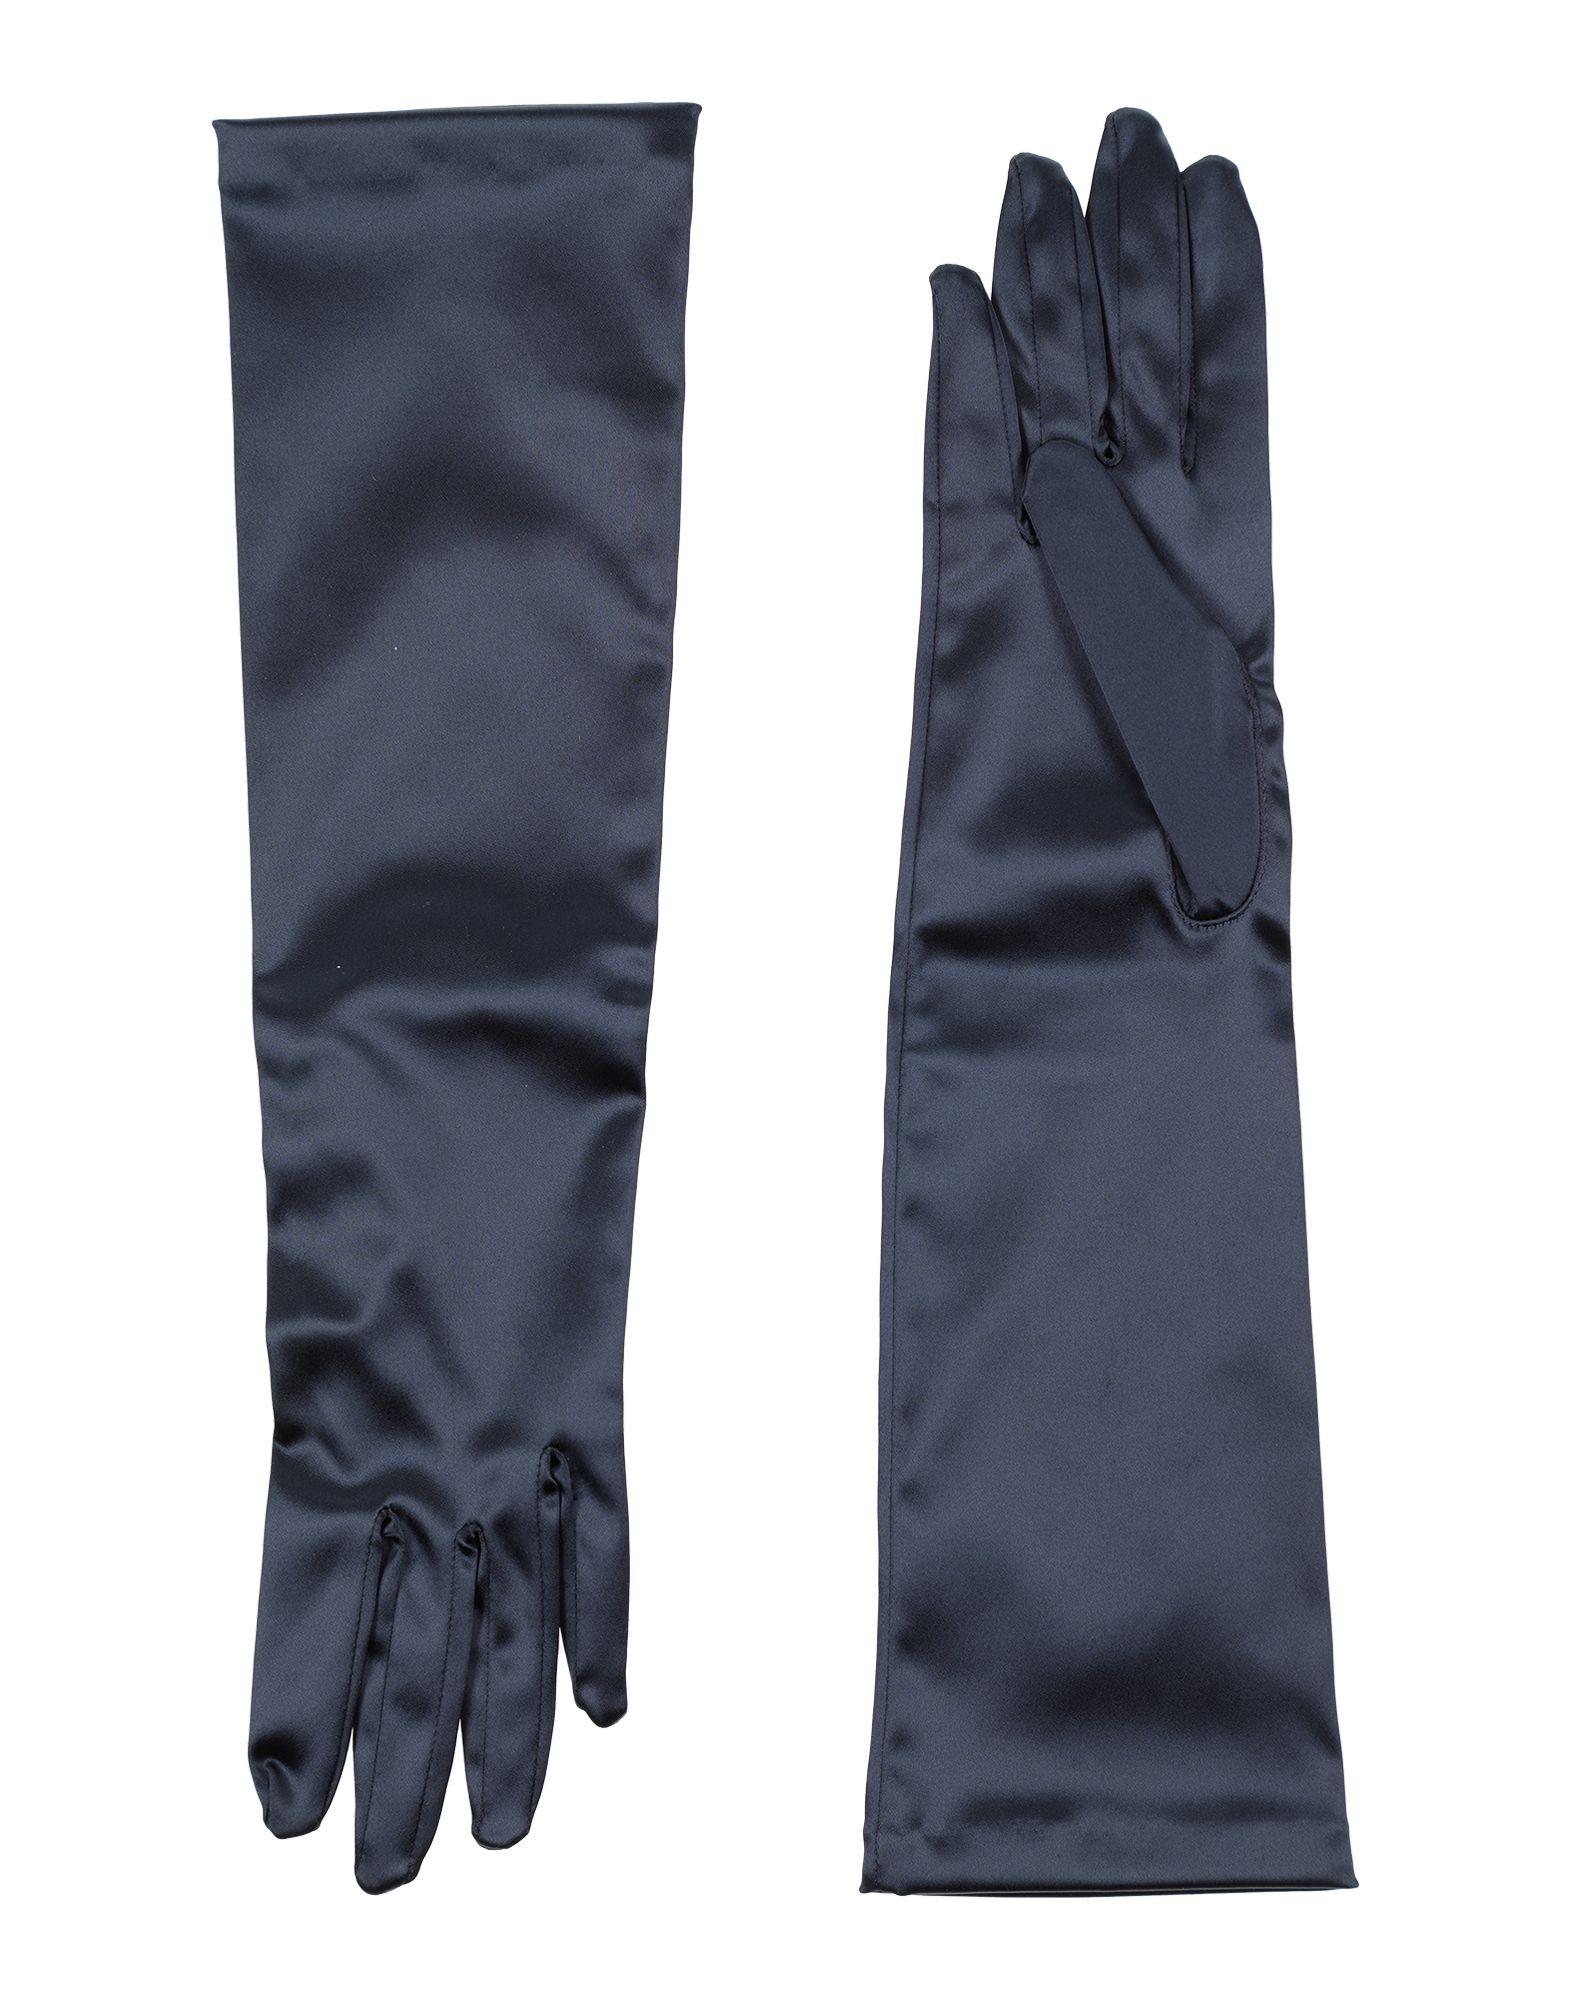 ALPO Damen Handschuhe Farbe Blau Größe 1